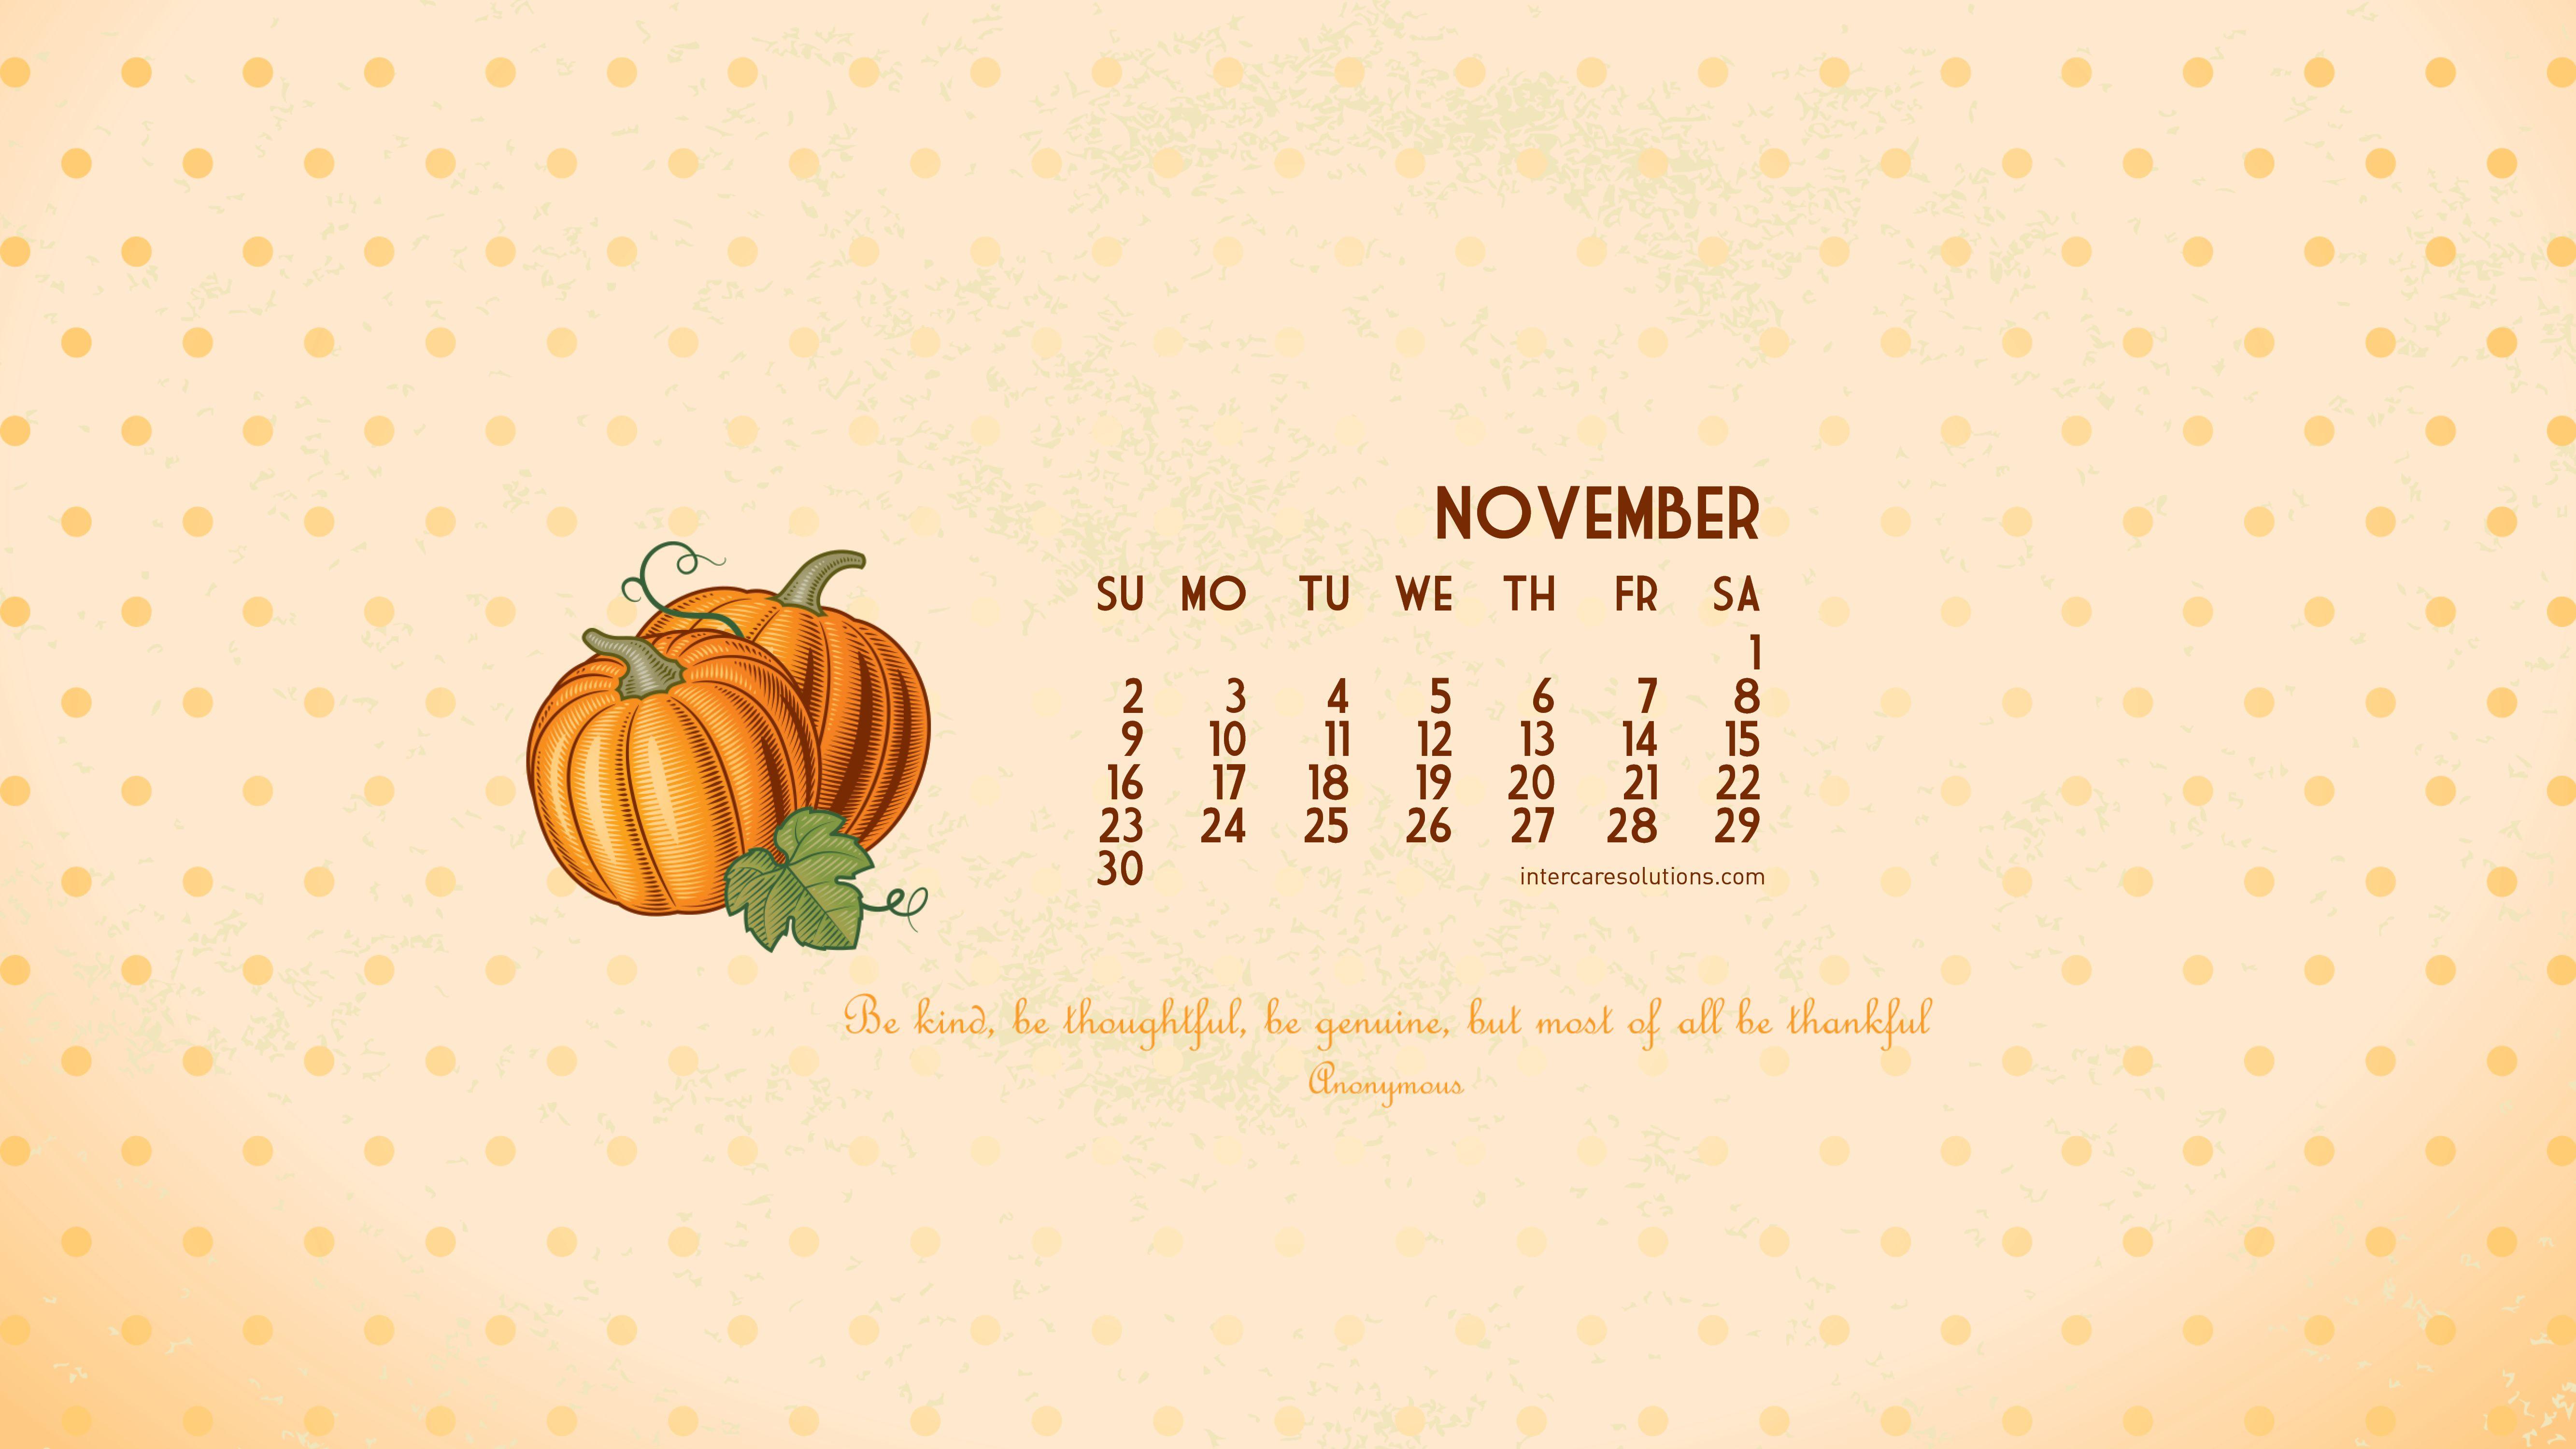 November 2014 Calendar Wallpaper